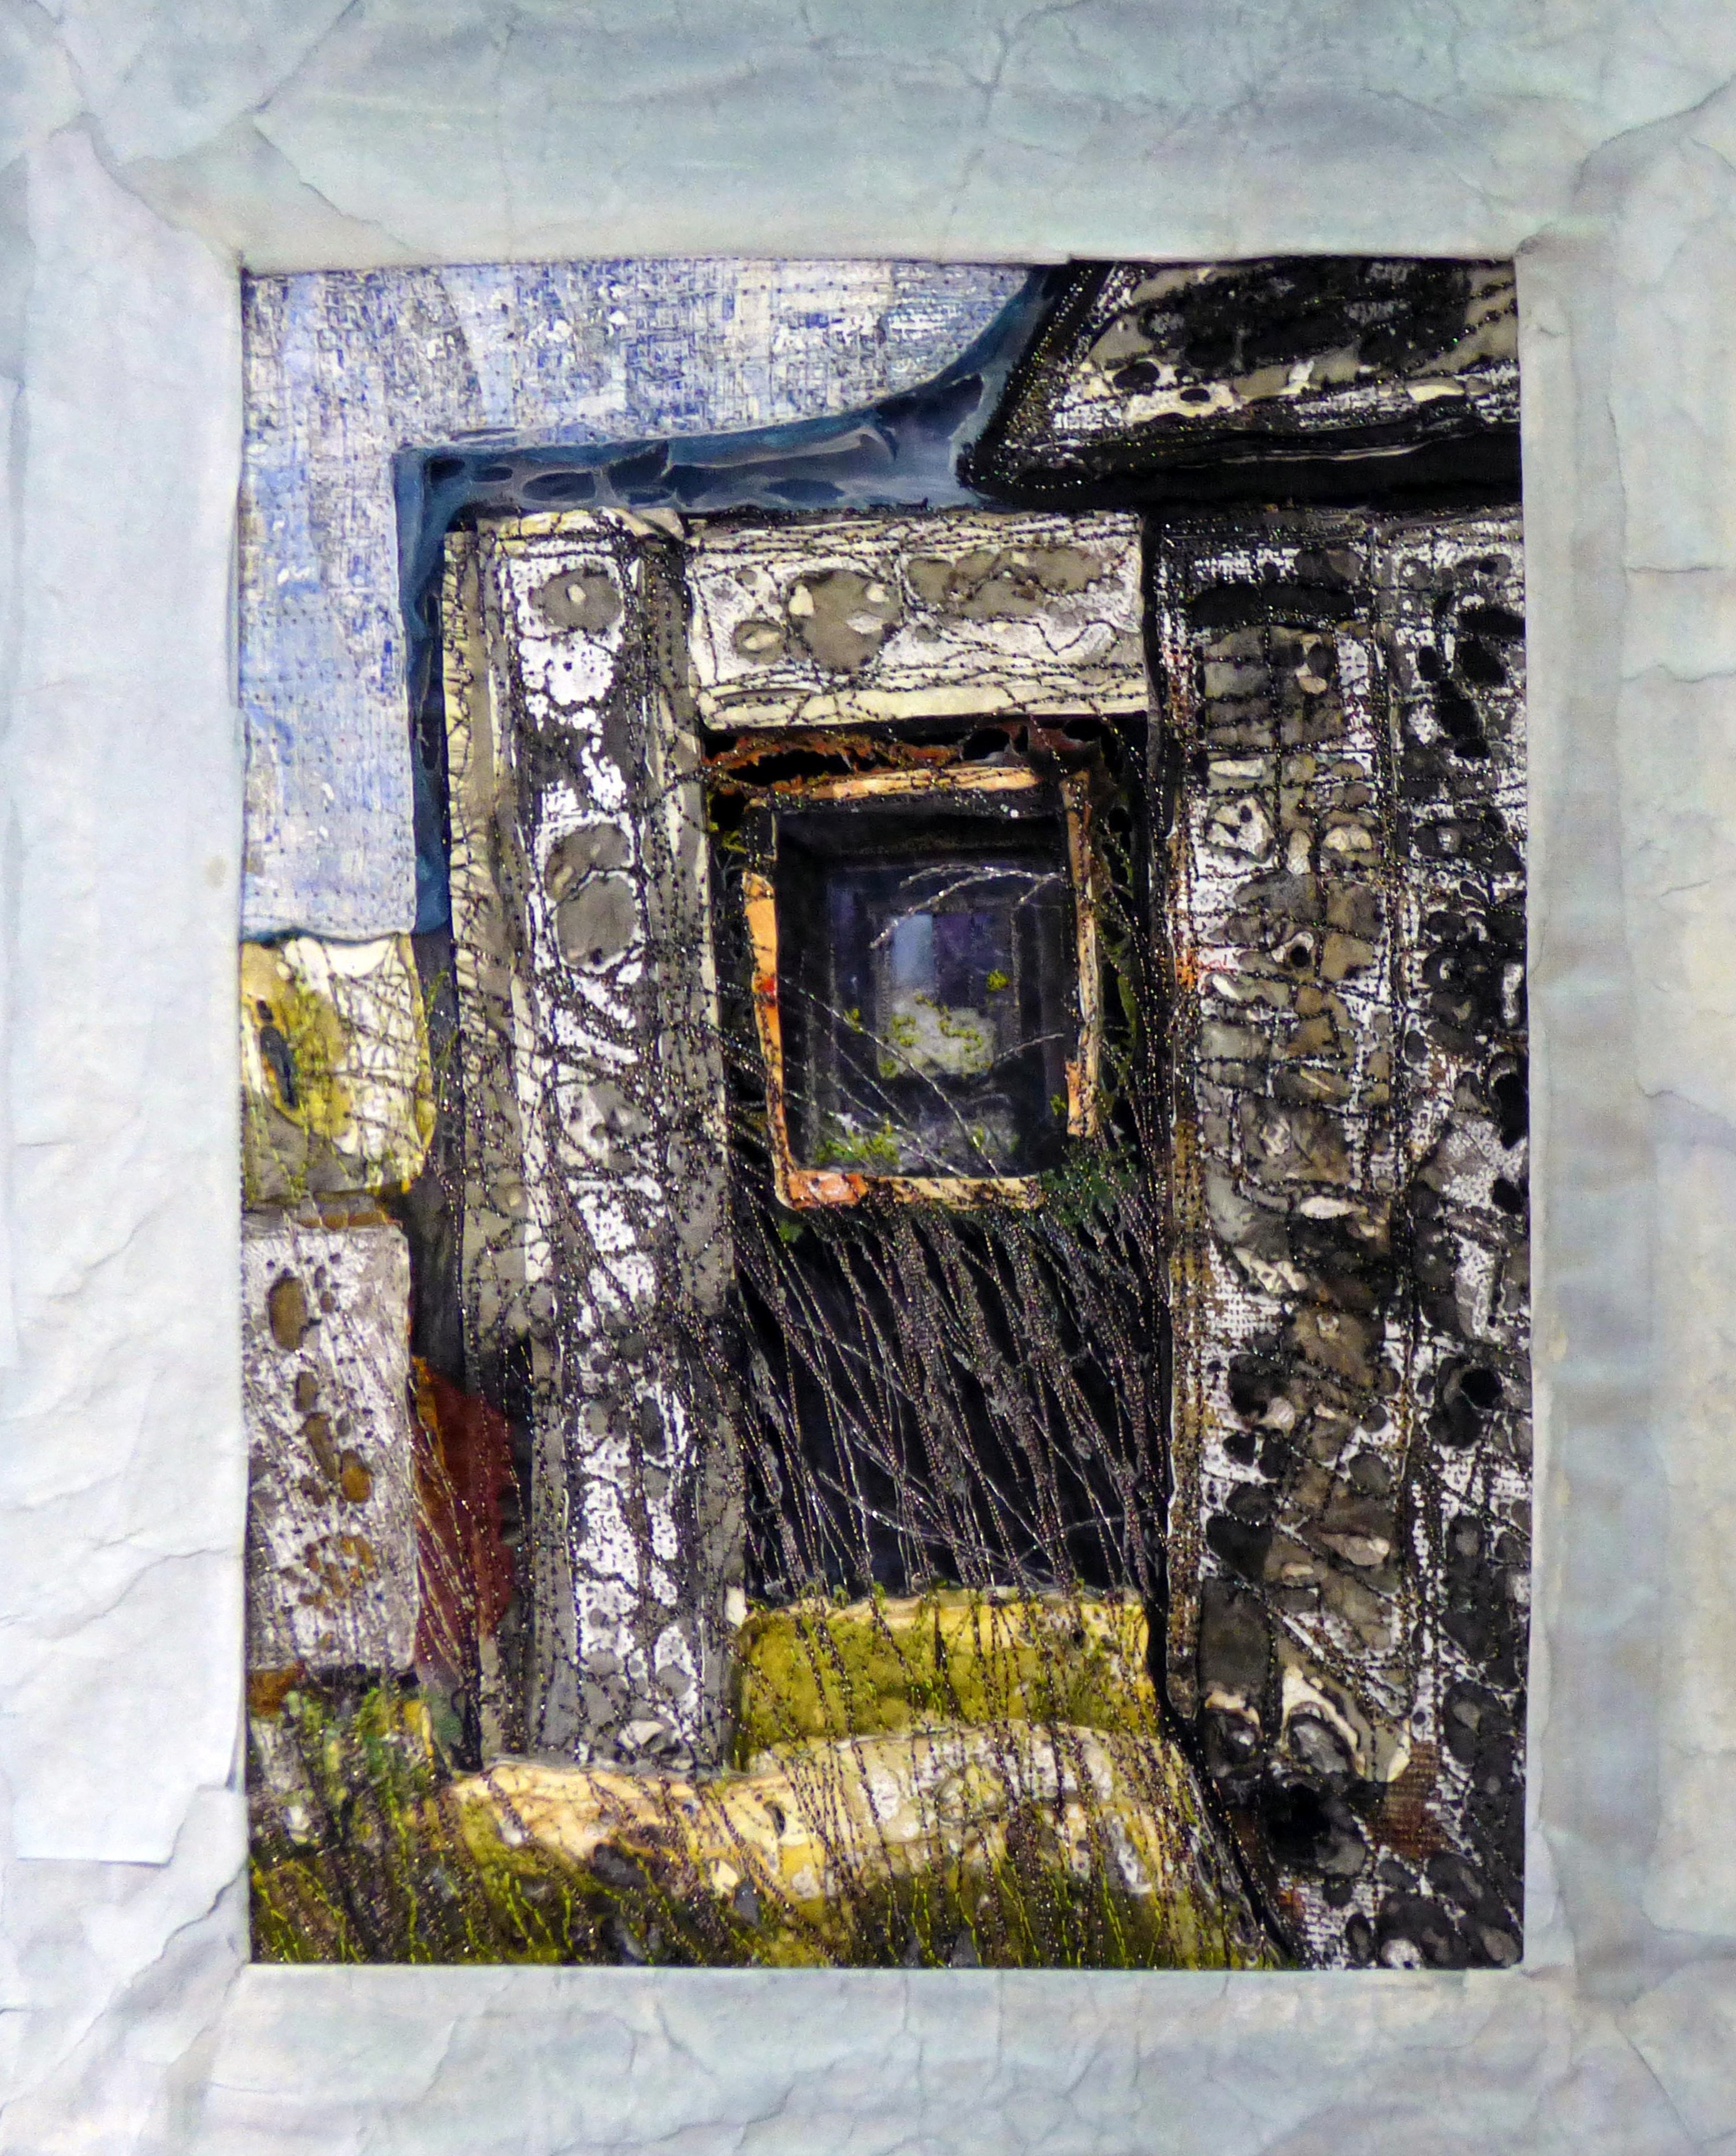 RHYDYMWYN; LOOKING THROUGH by Alison Corfield, N.Wales EG, machine embroidererd mixed media